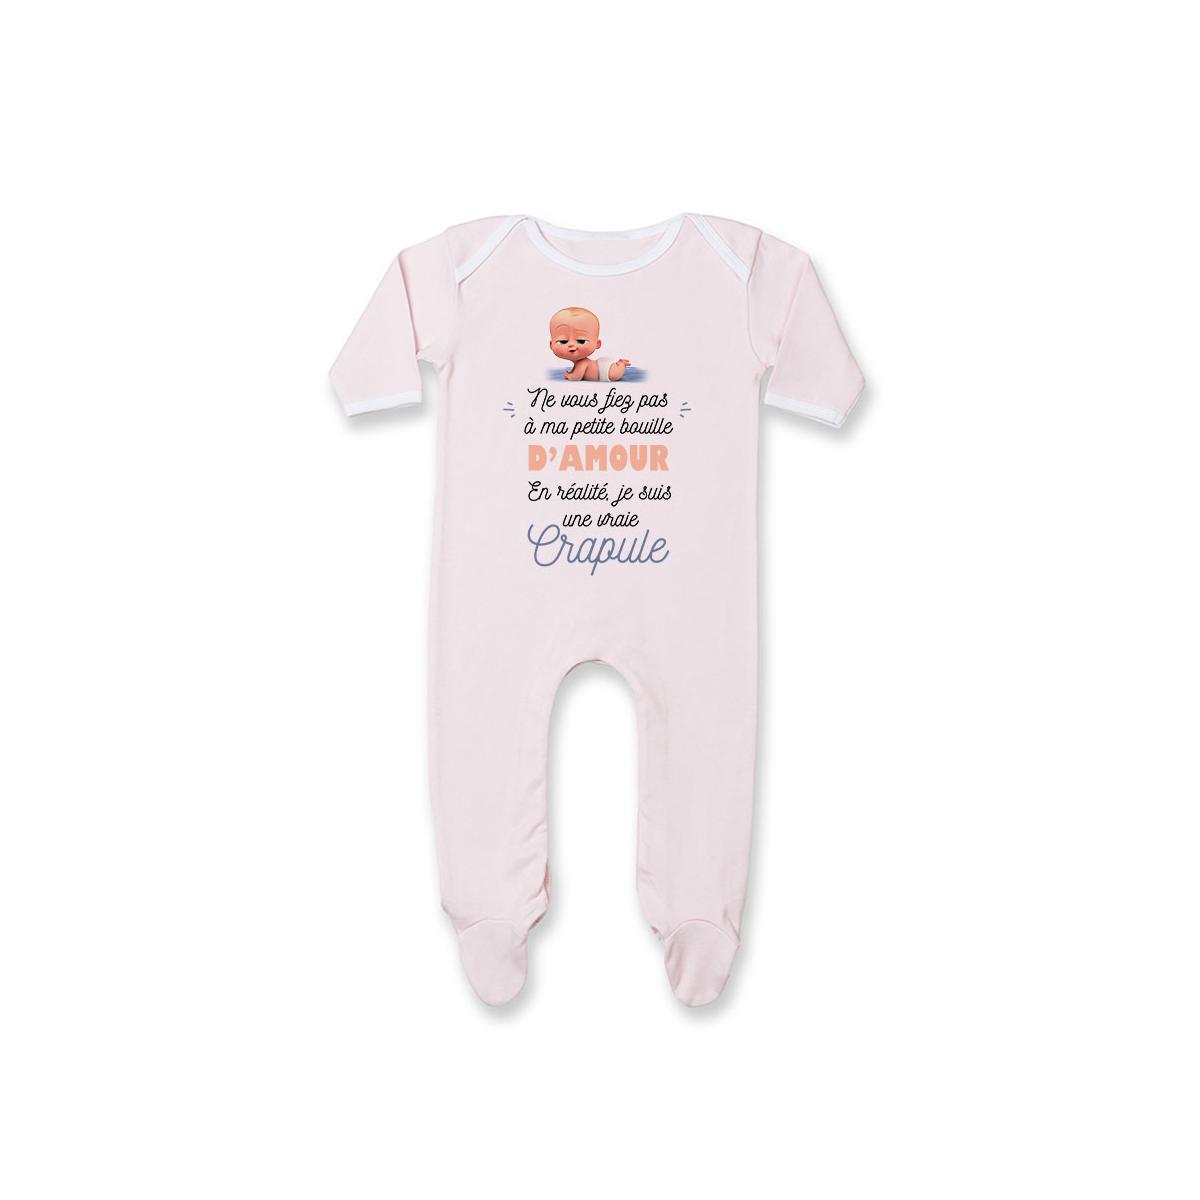 Pyjama bébé Une vraie crapule